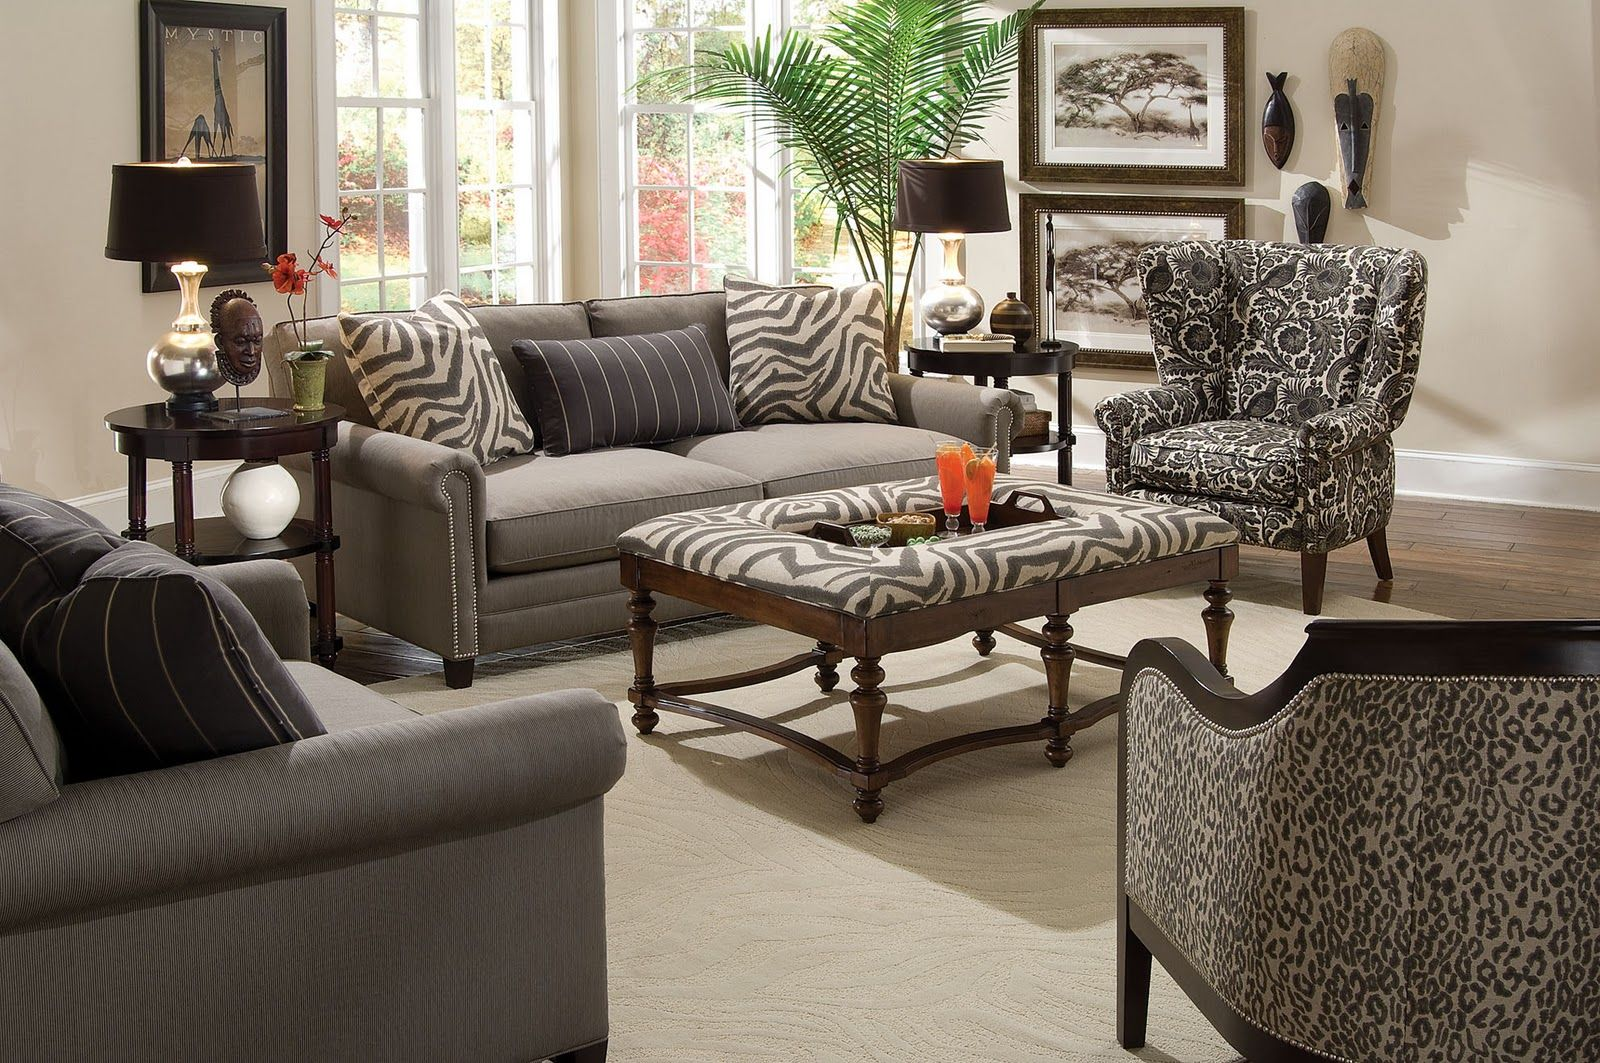 new living room furniture styles. 14 Animal Inspired Decor Ideas For Your Living Room New Furniture Styles Pinterest